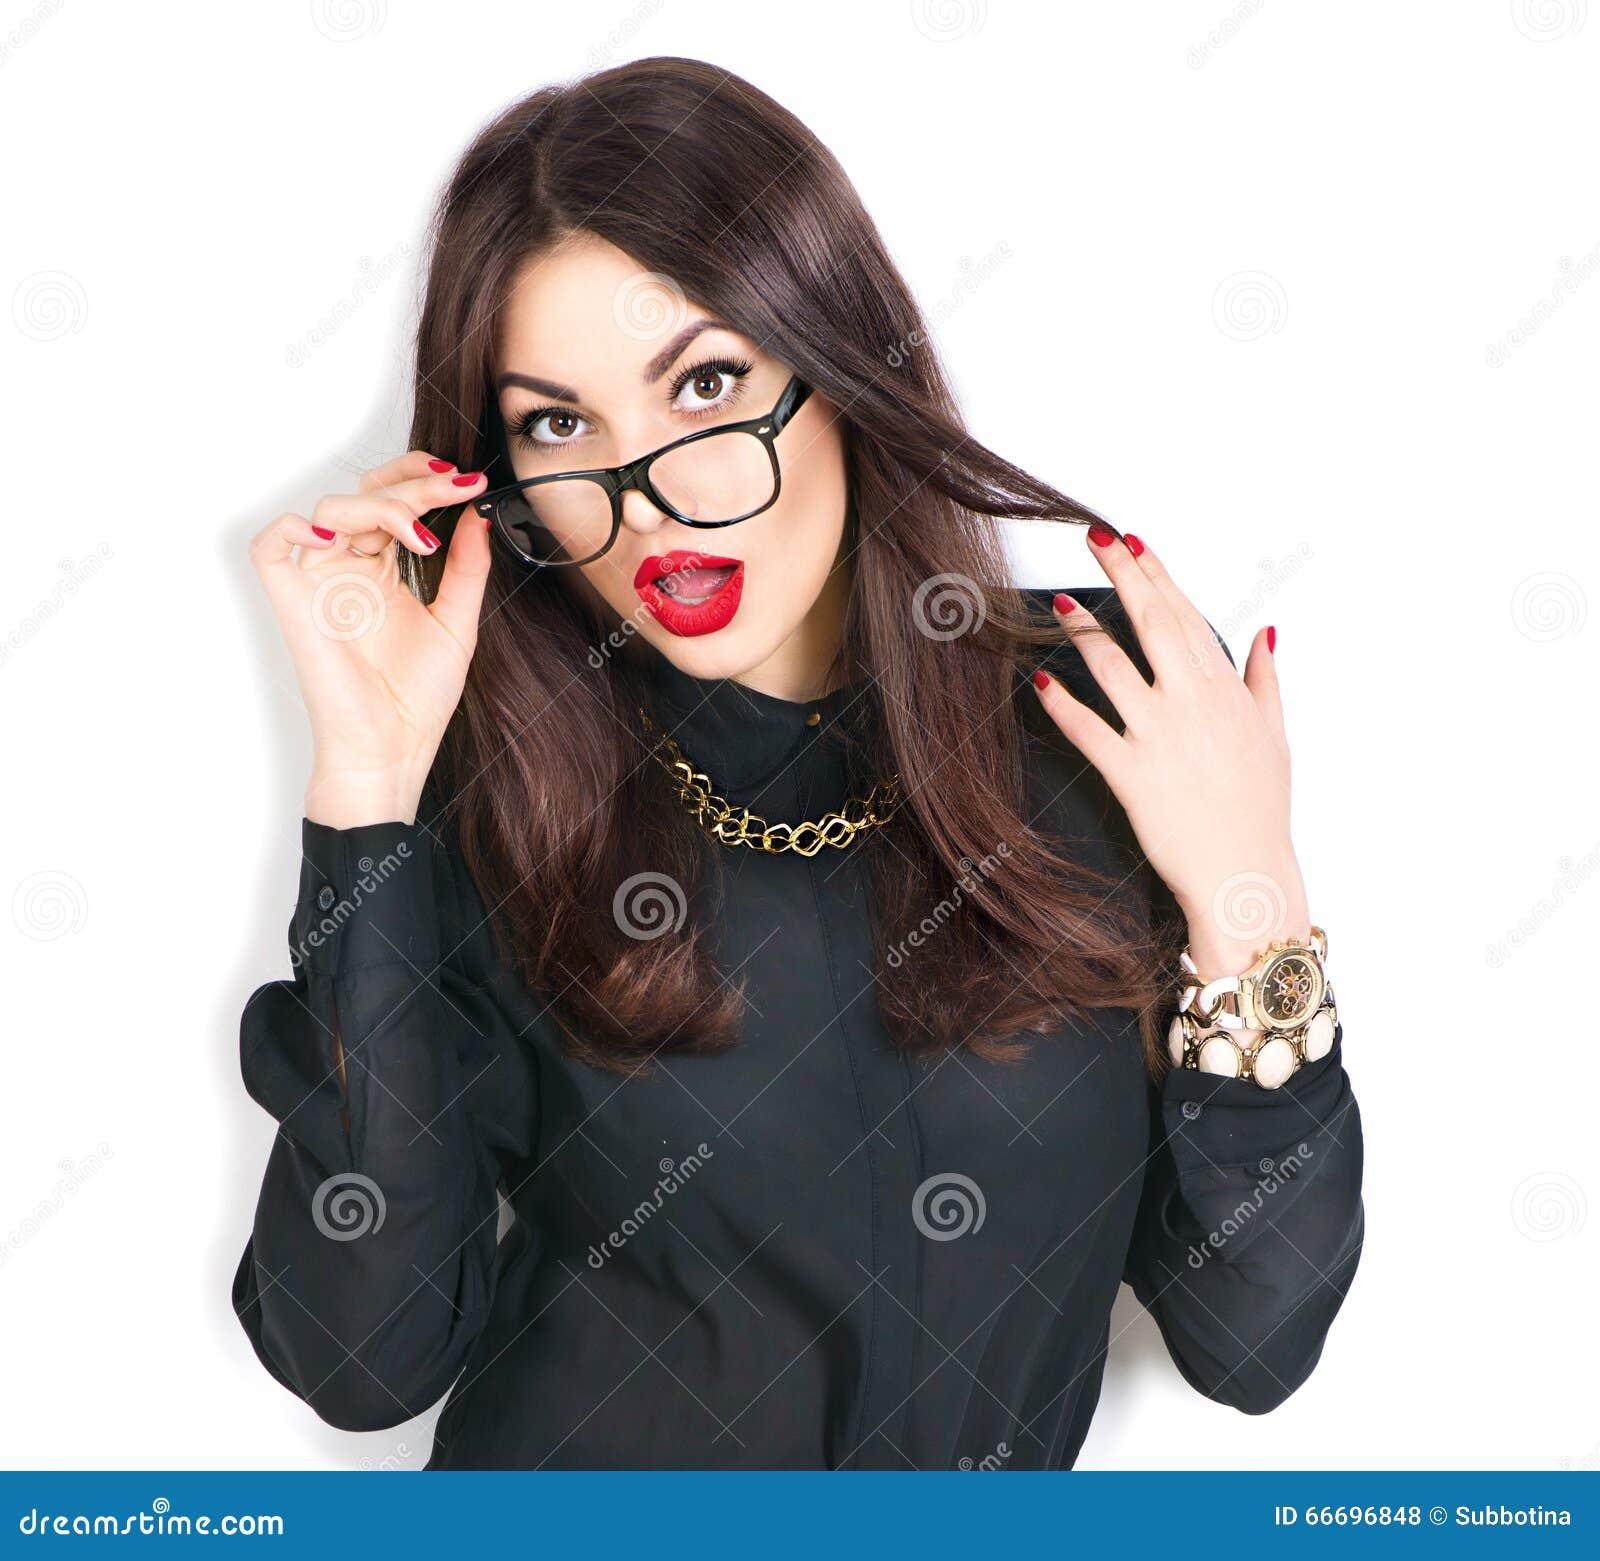 4eaab8f33 Beauty fashion model girl wearing glasses, isolated on white background.  More similar stock images